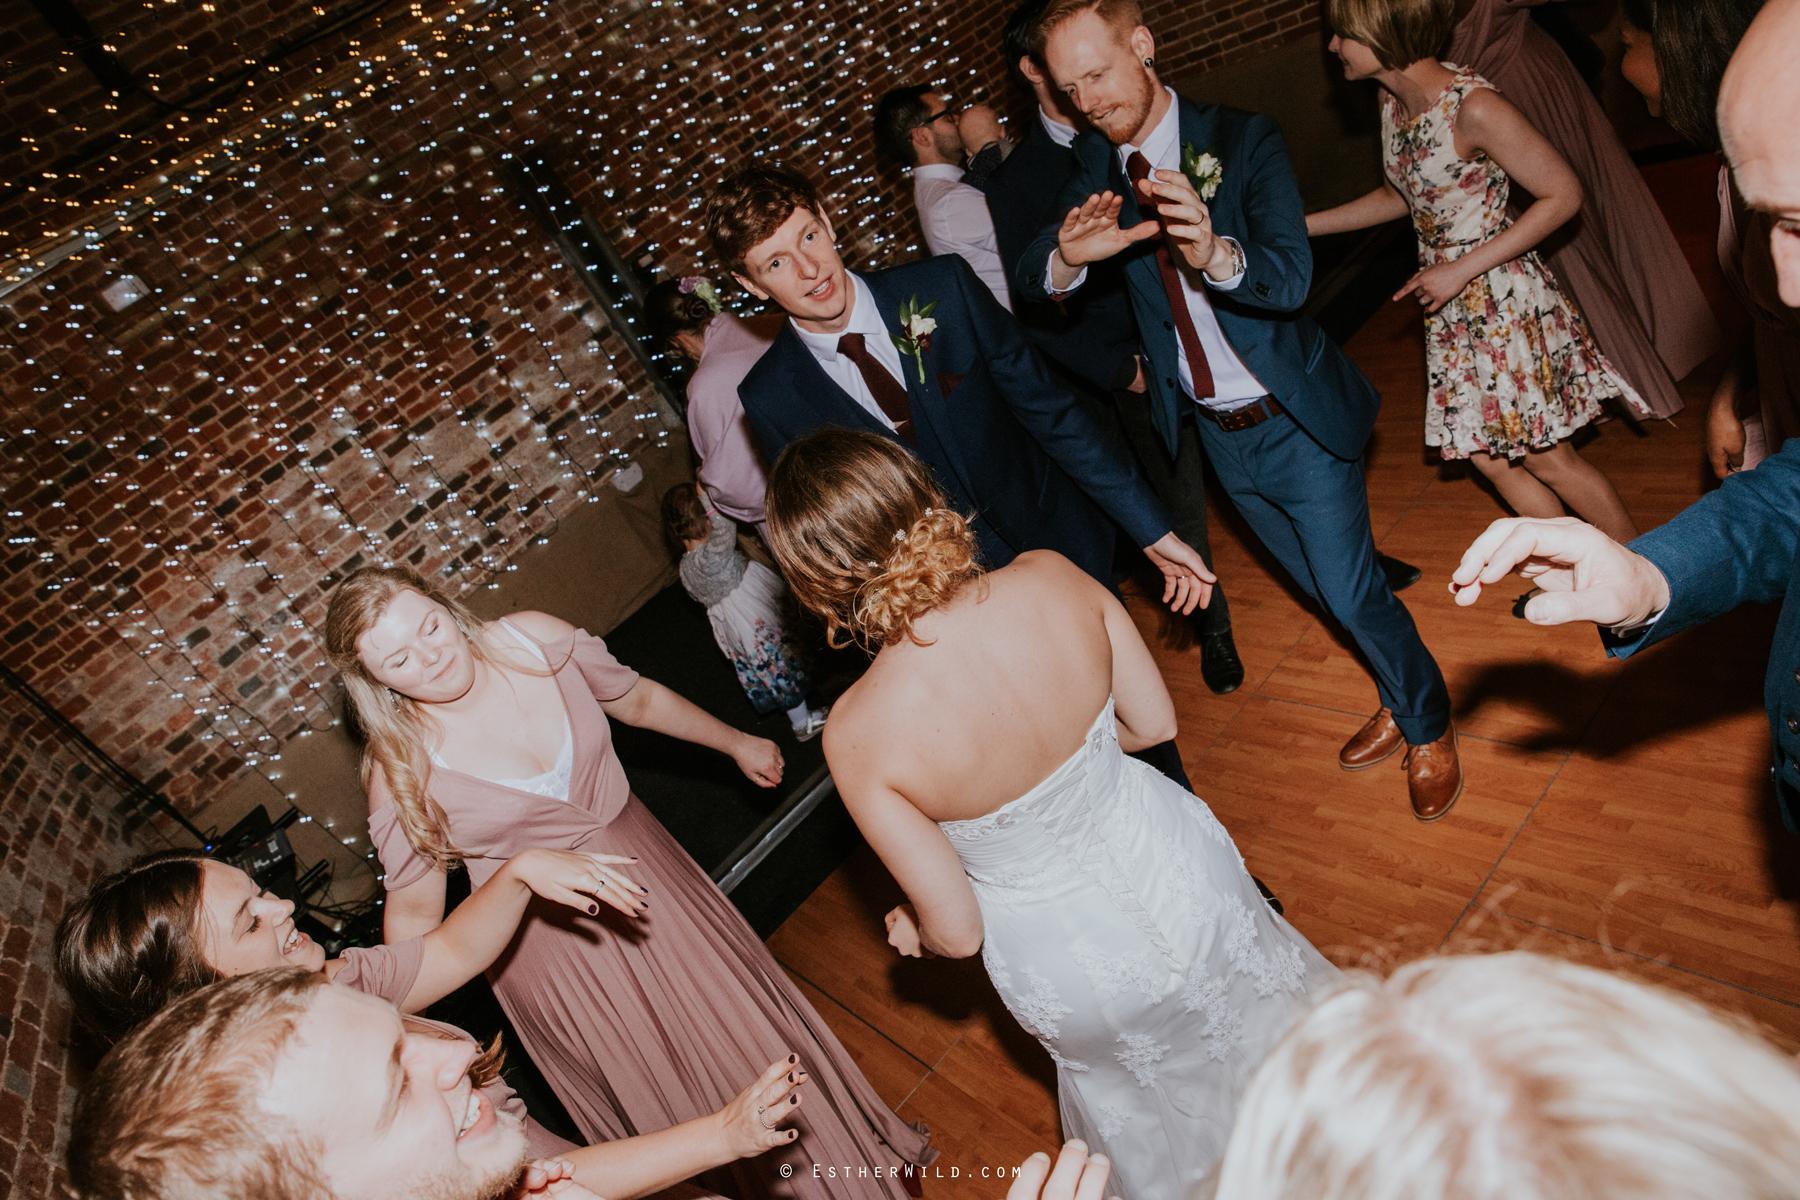 Glebe_Farm_Barn_Rustic_Norfolk_Wedding_Esther_Wild_Photographer_Copyright_IMG_2954.jpg